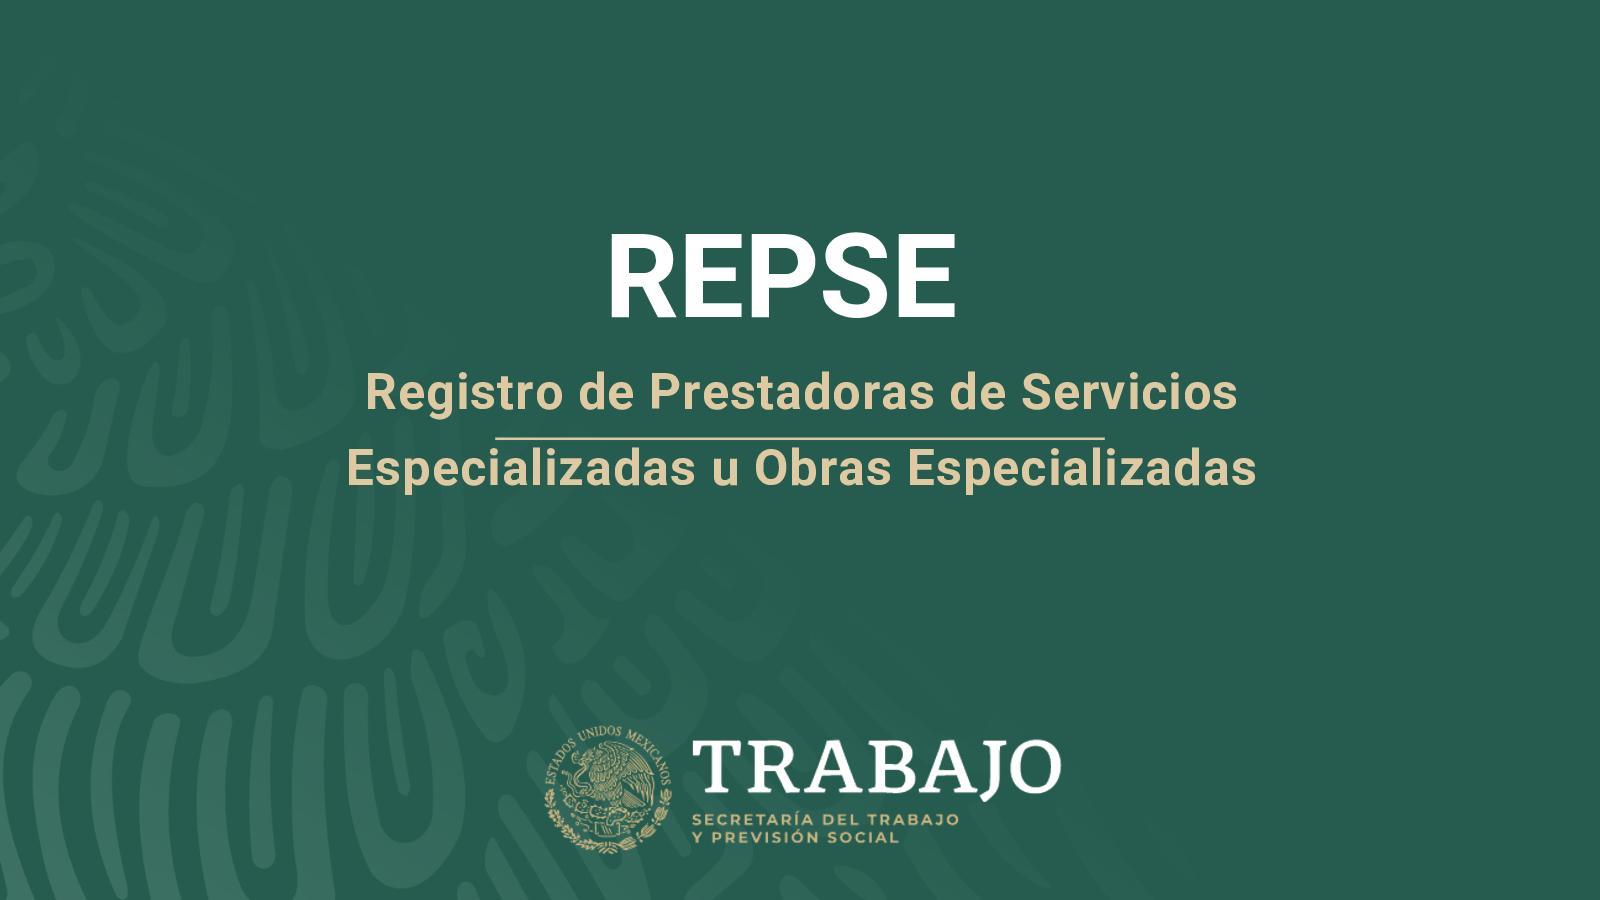 REPSE